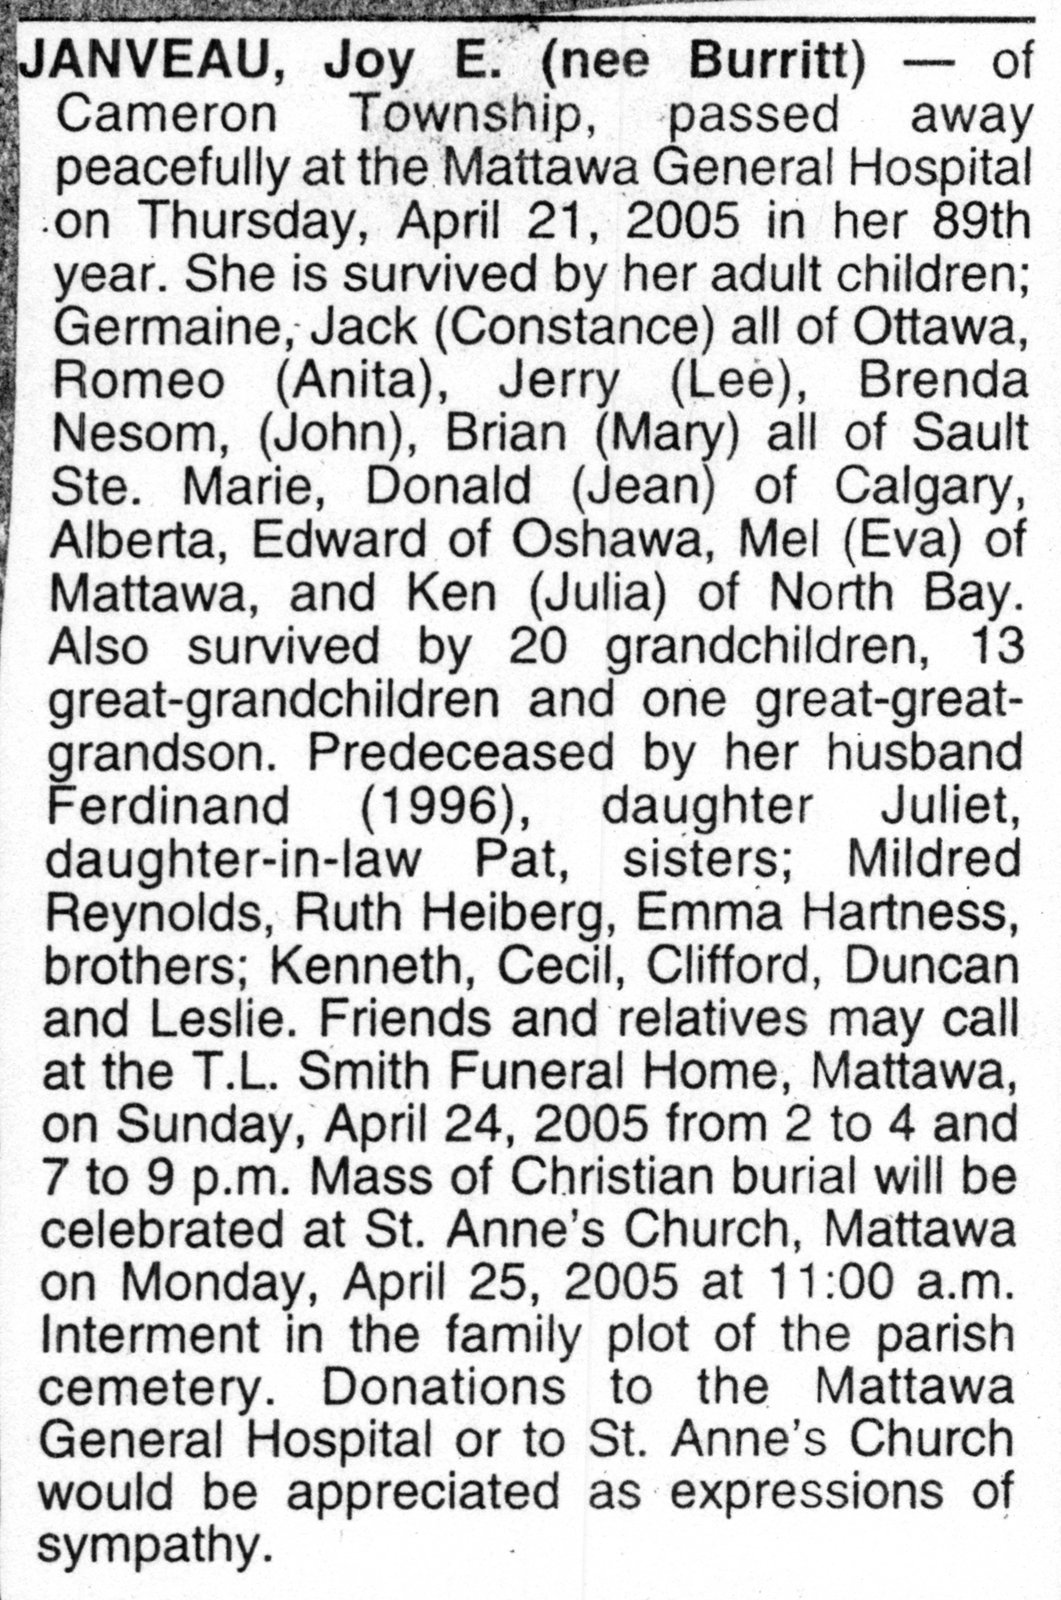 Nécrologie / Obituary Joy E. Janveau (née Burritt)